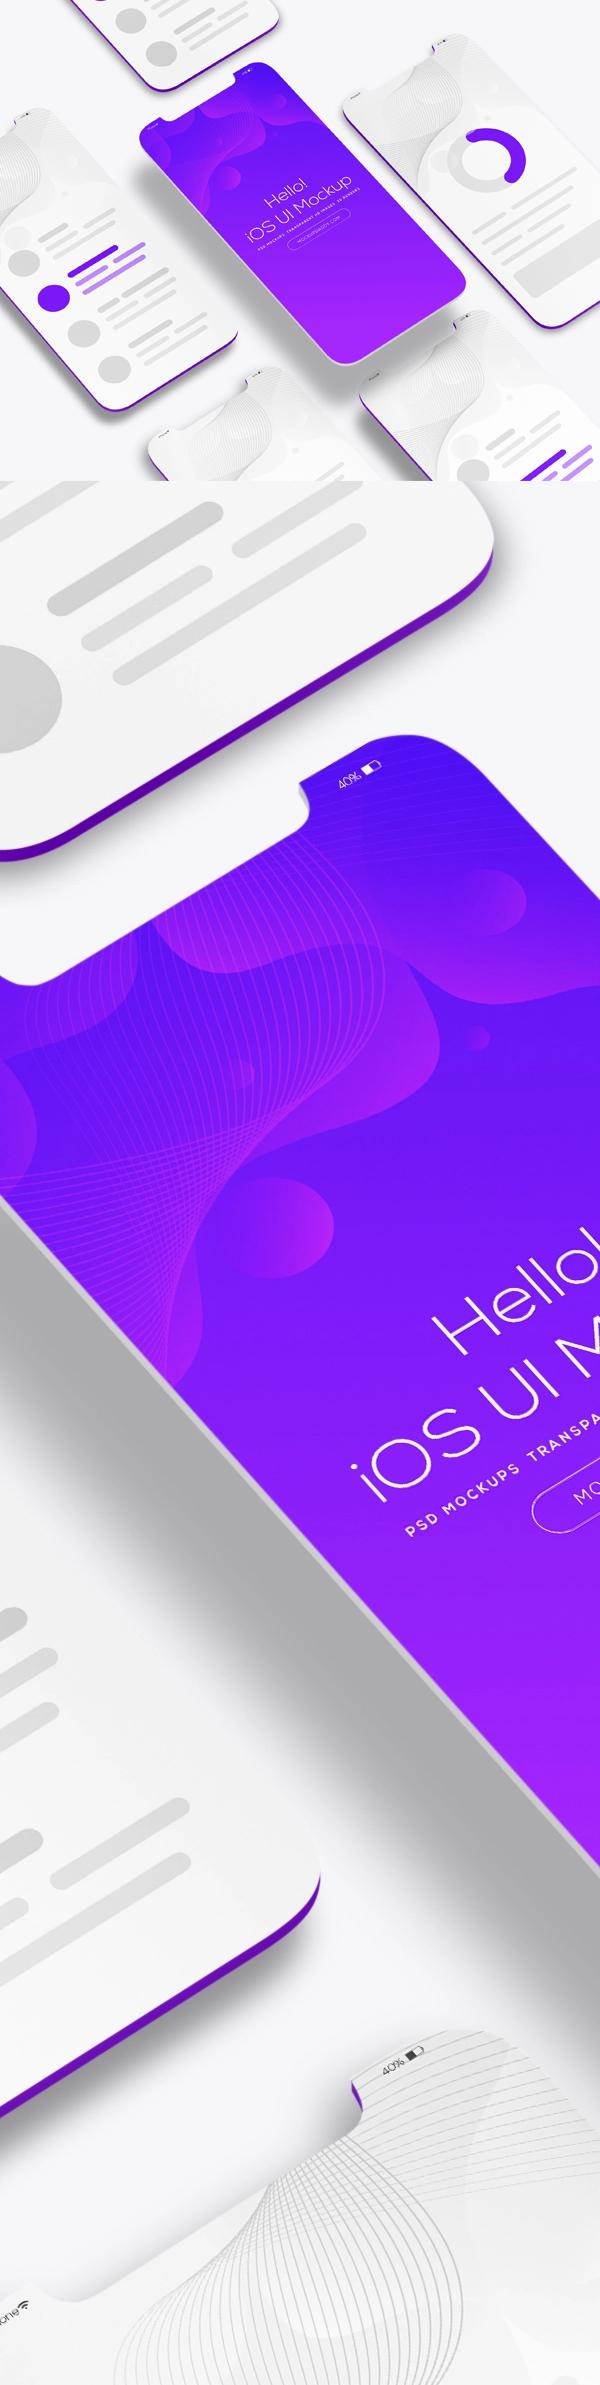 Free Ui Design Isometric Mockup